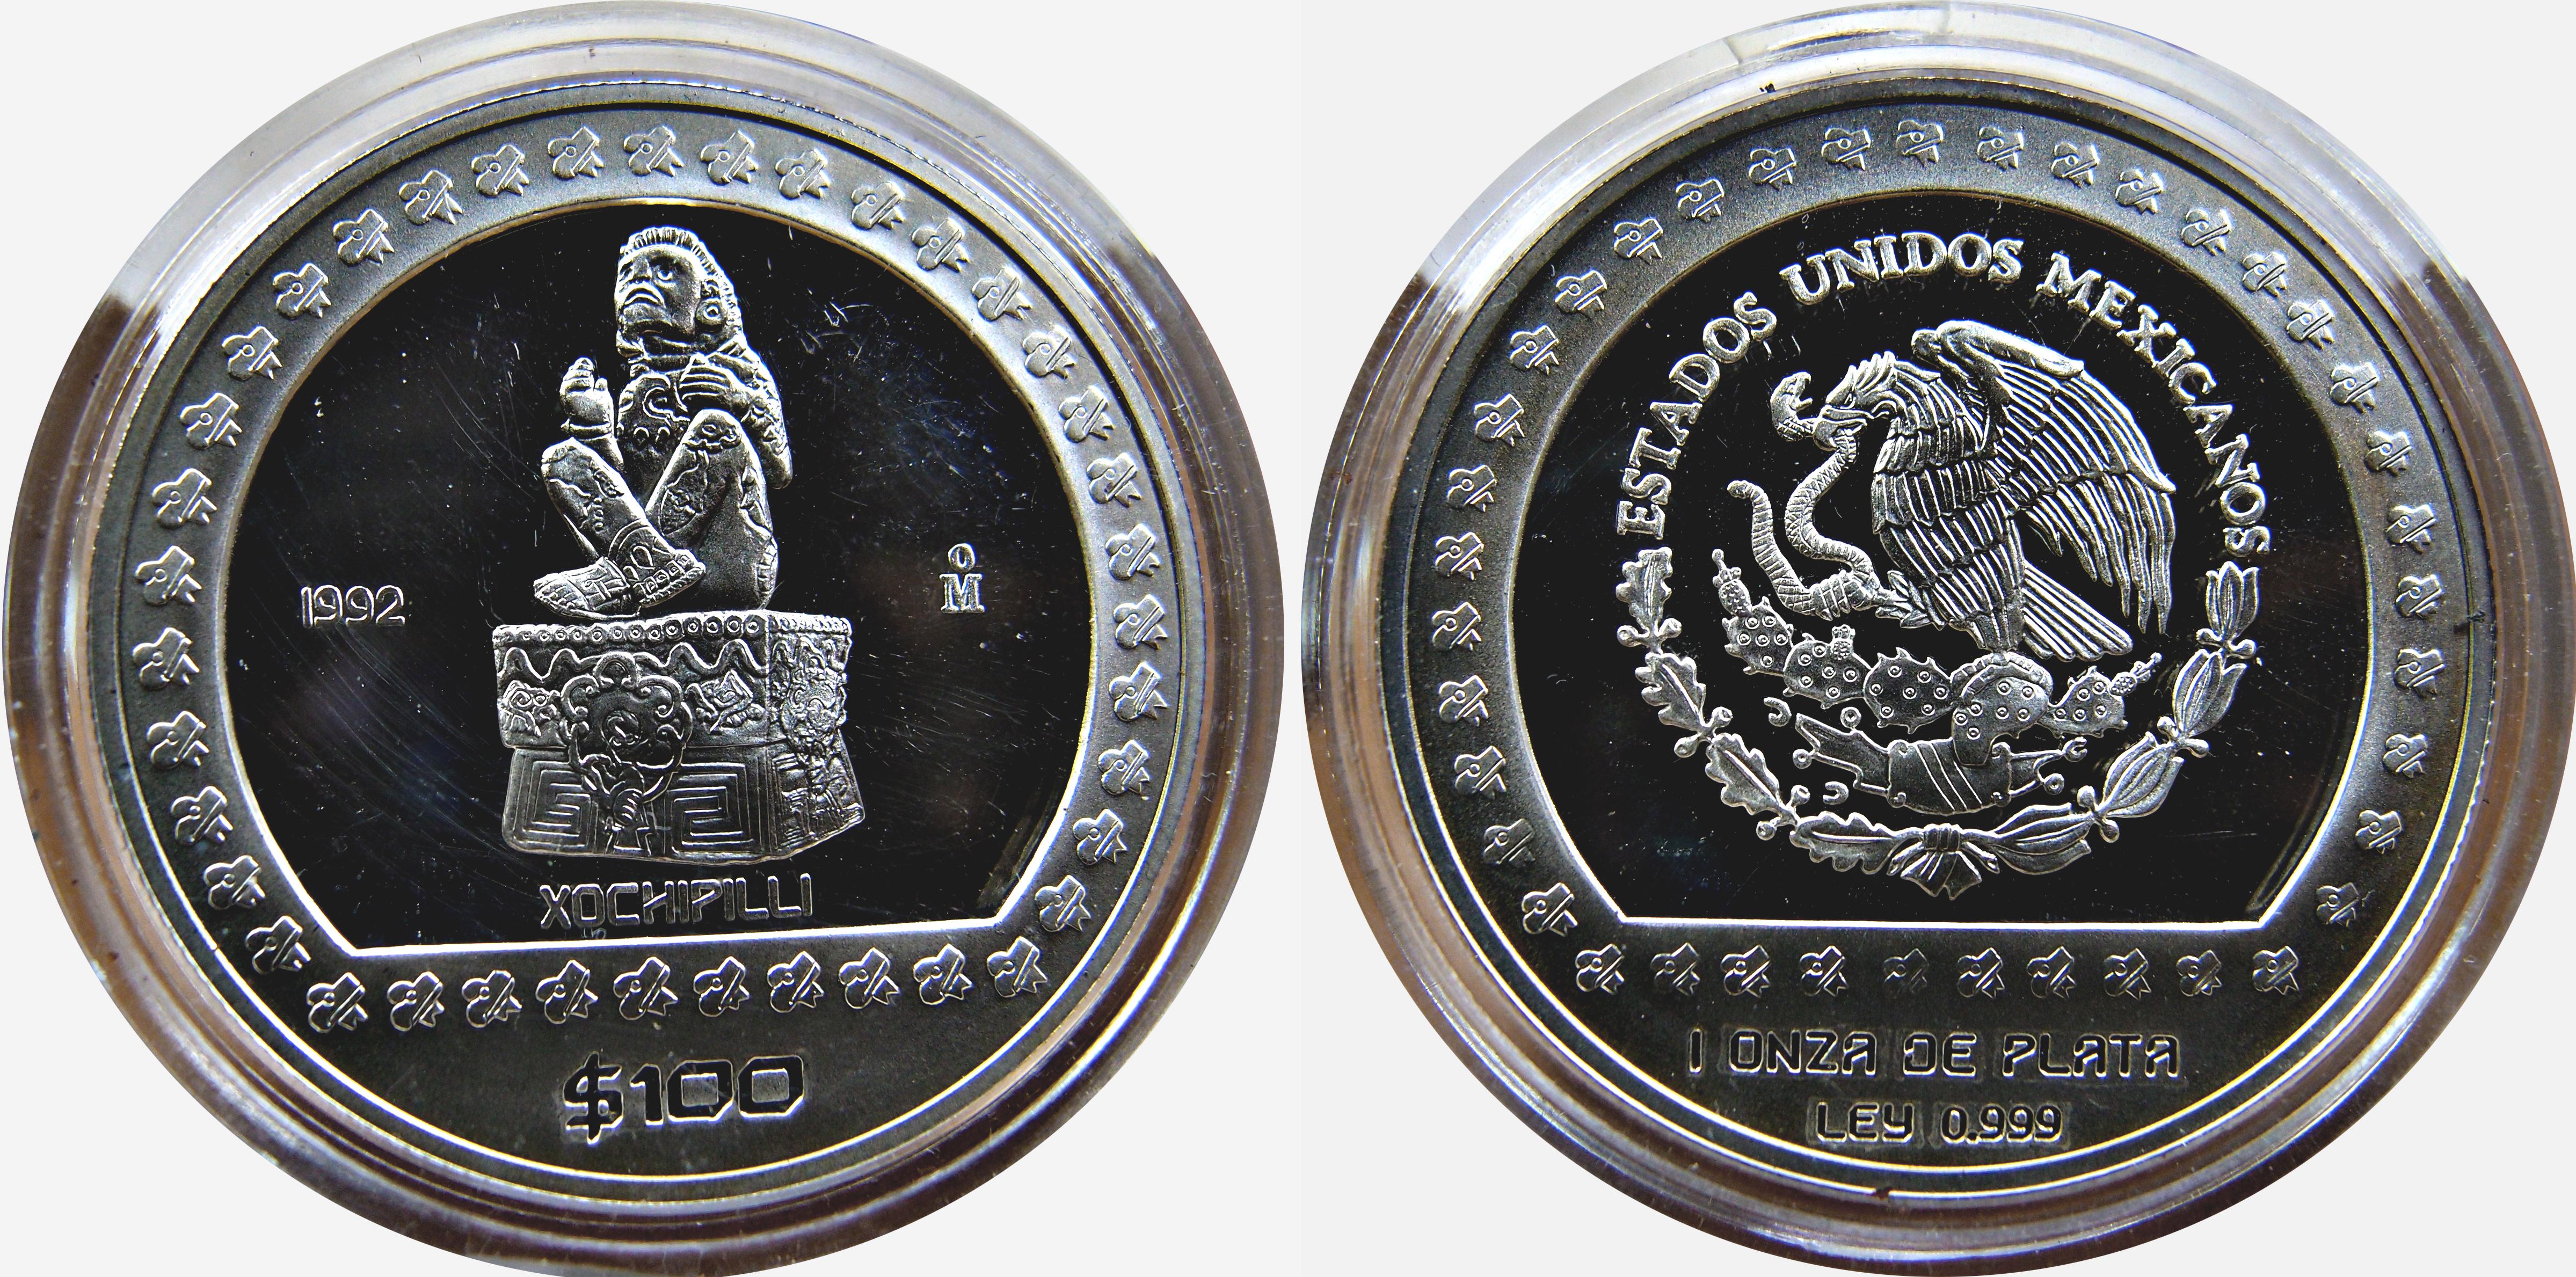 Colección Precolombina de onzas de plata del Banco de Mexico 12123508853_893d6e4760_o